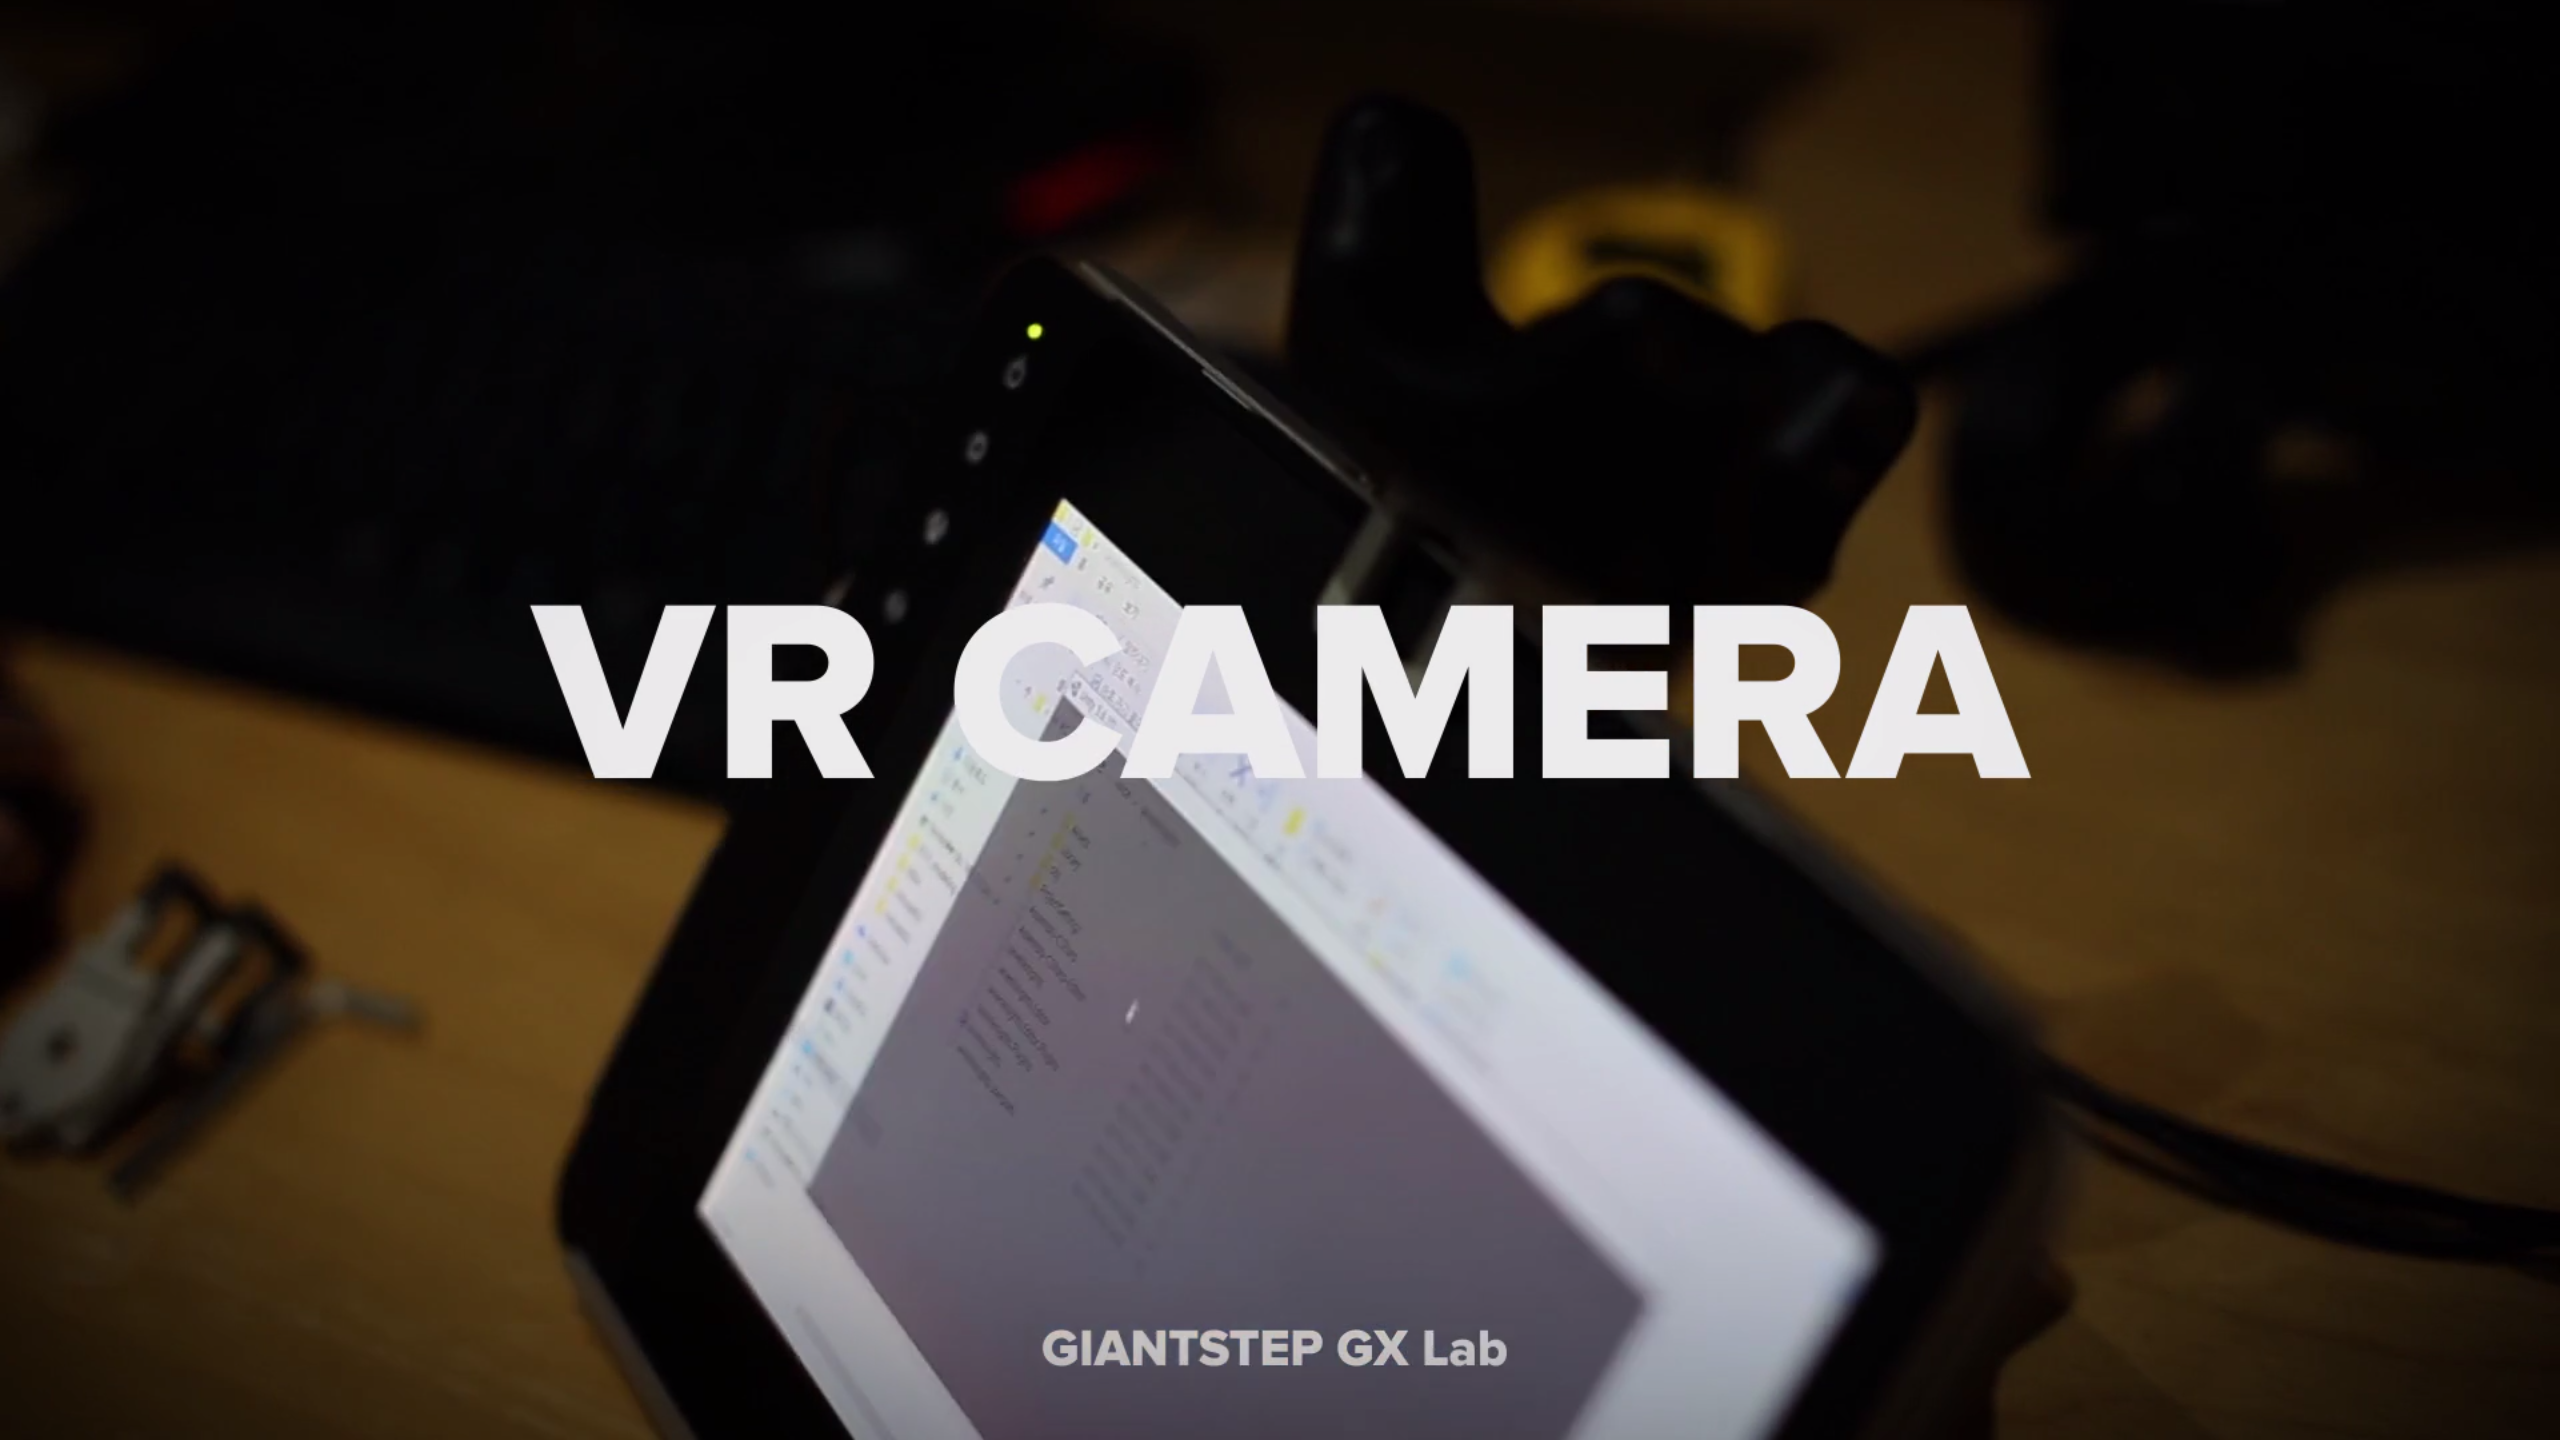 GX lab - VR CAMERA